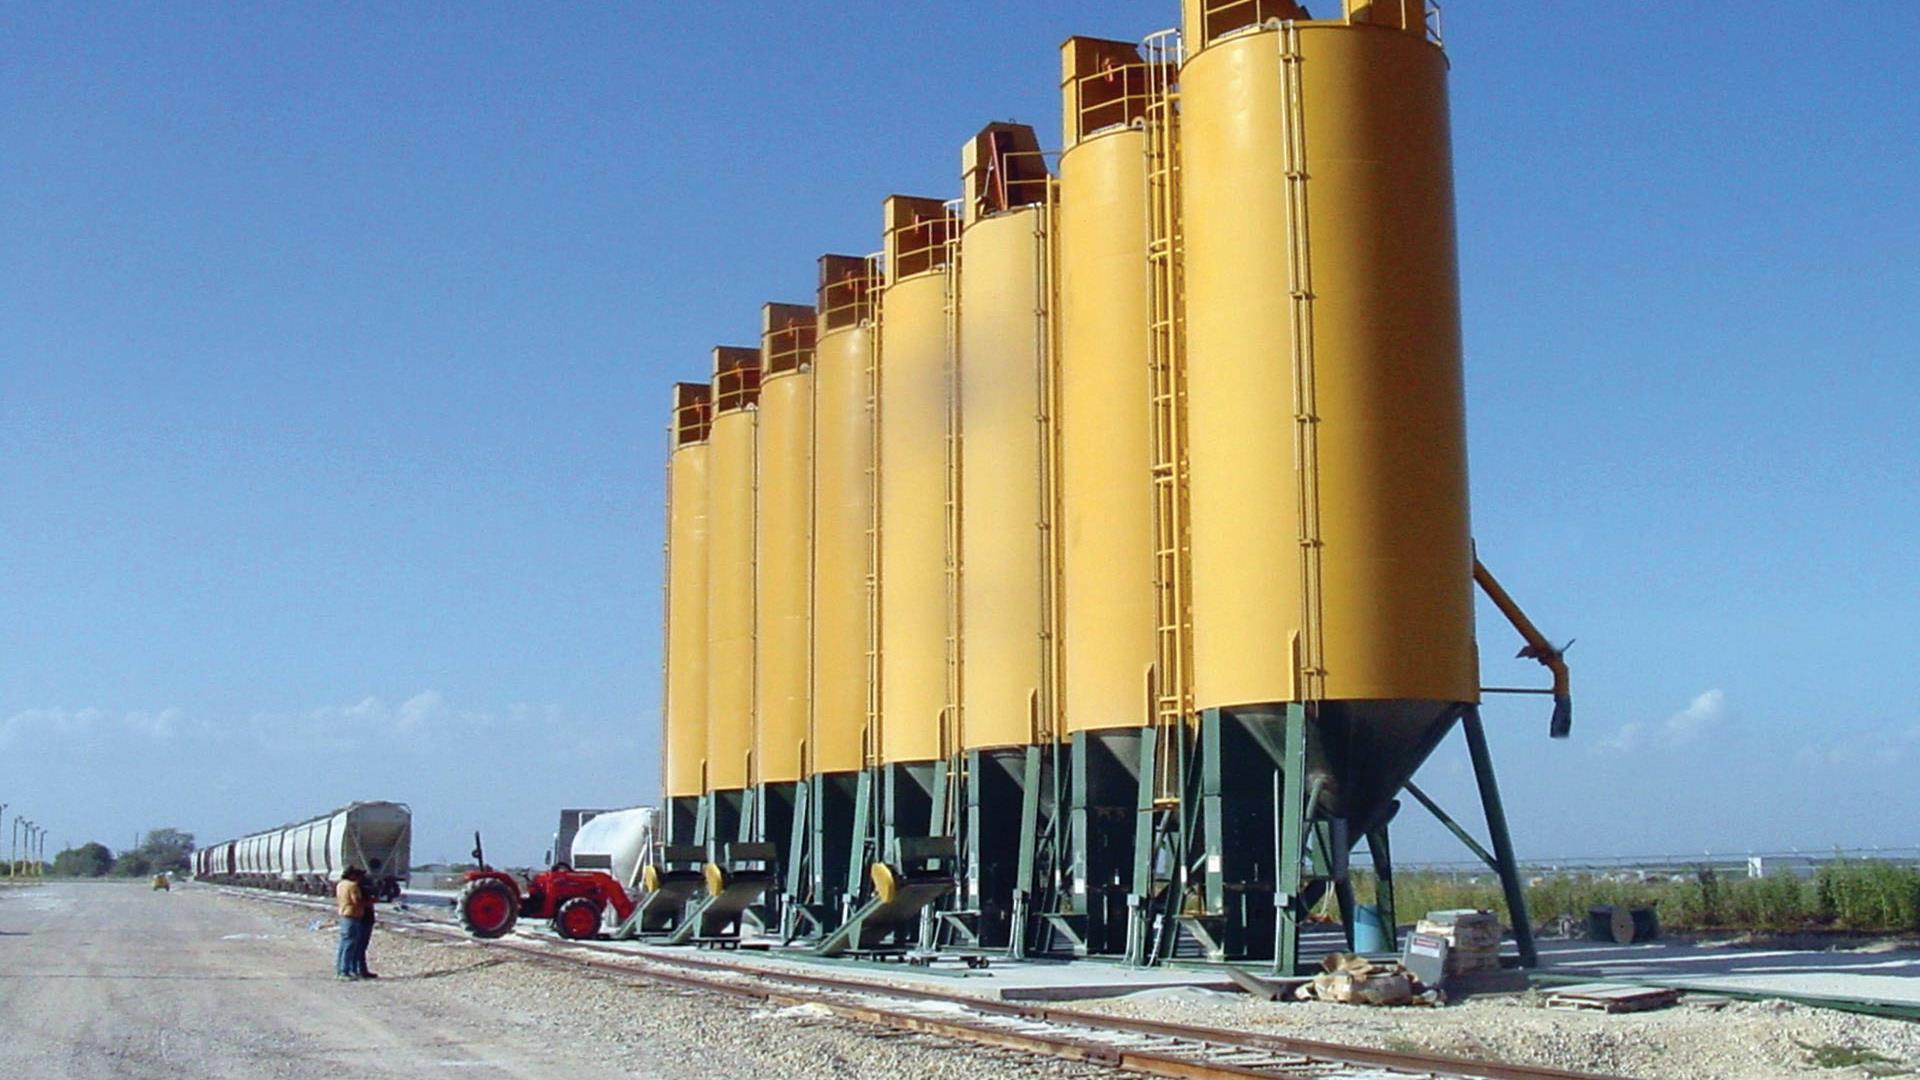 A row of storage APPCO E-Tanks